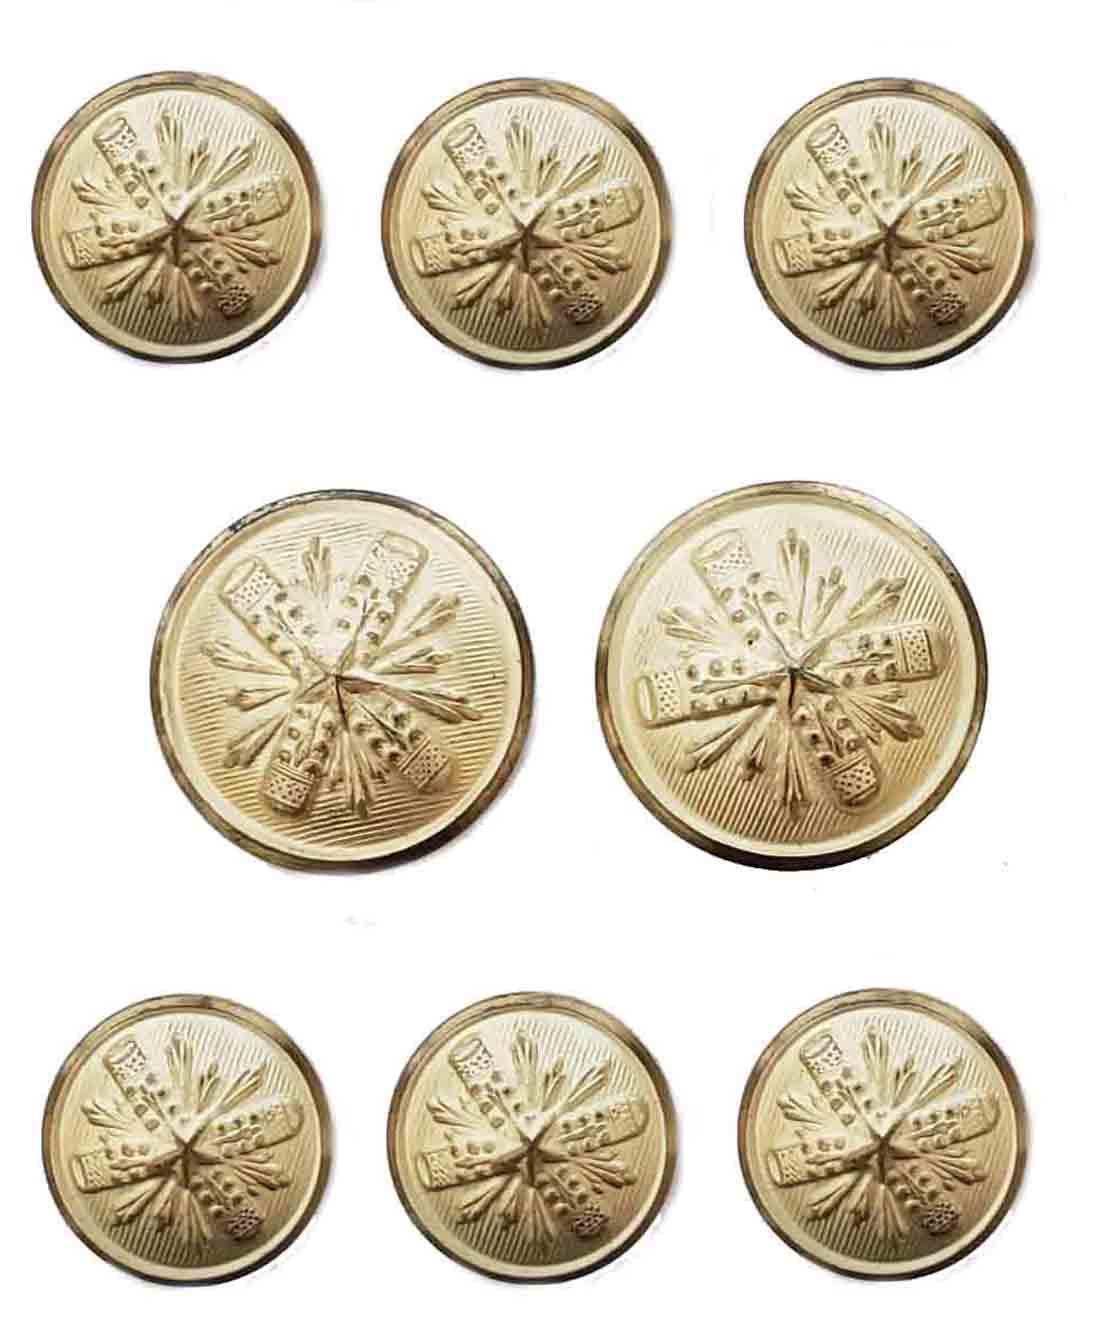 Vintage Bellamin Blazer Buttons Set Gold Brass Shank Starburst Pattern Men's